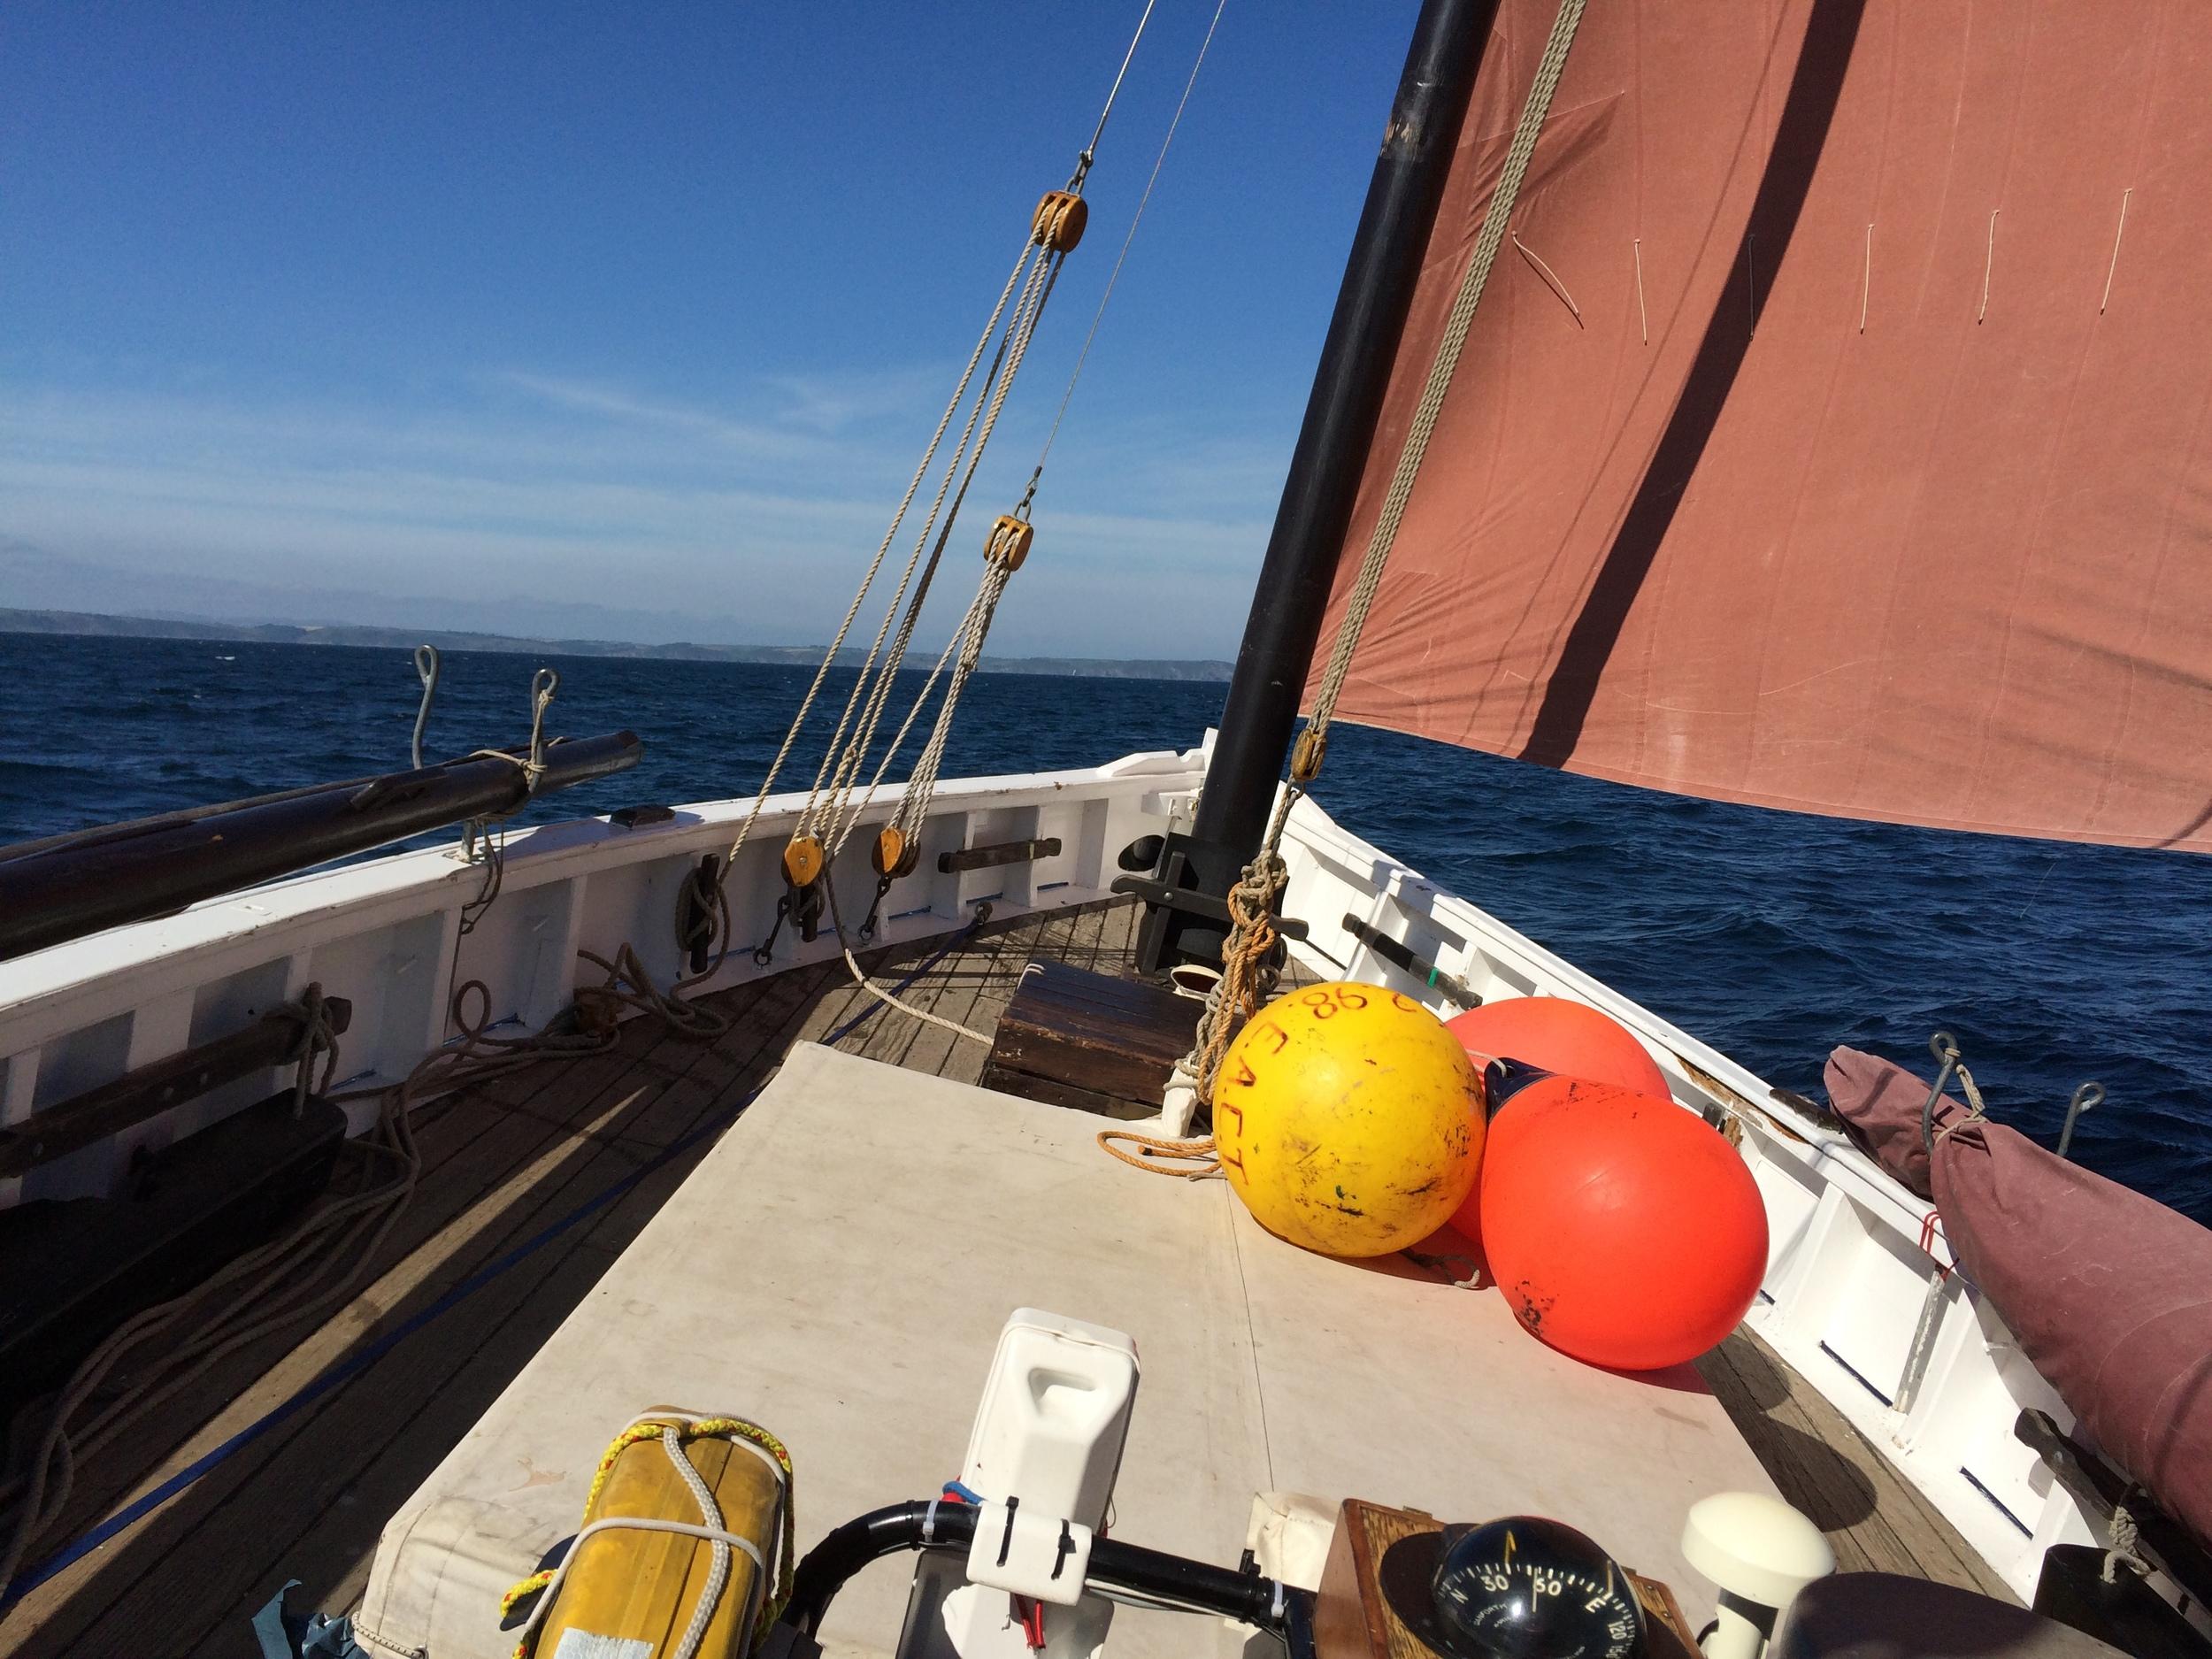 Sailing Calendar — Mount's Bay Lugger Association